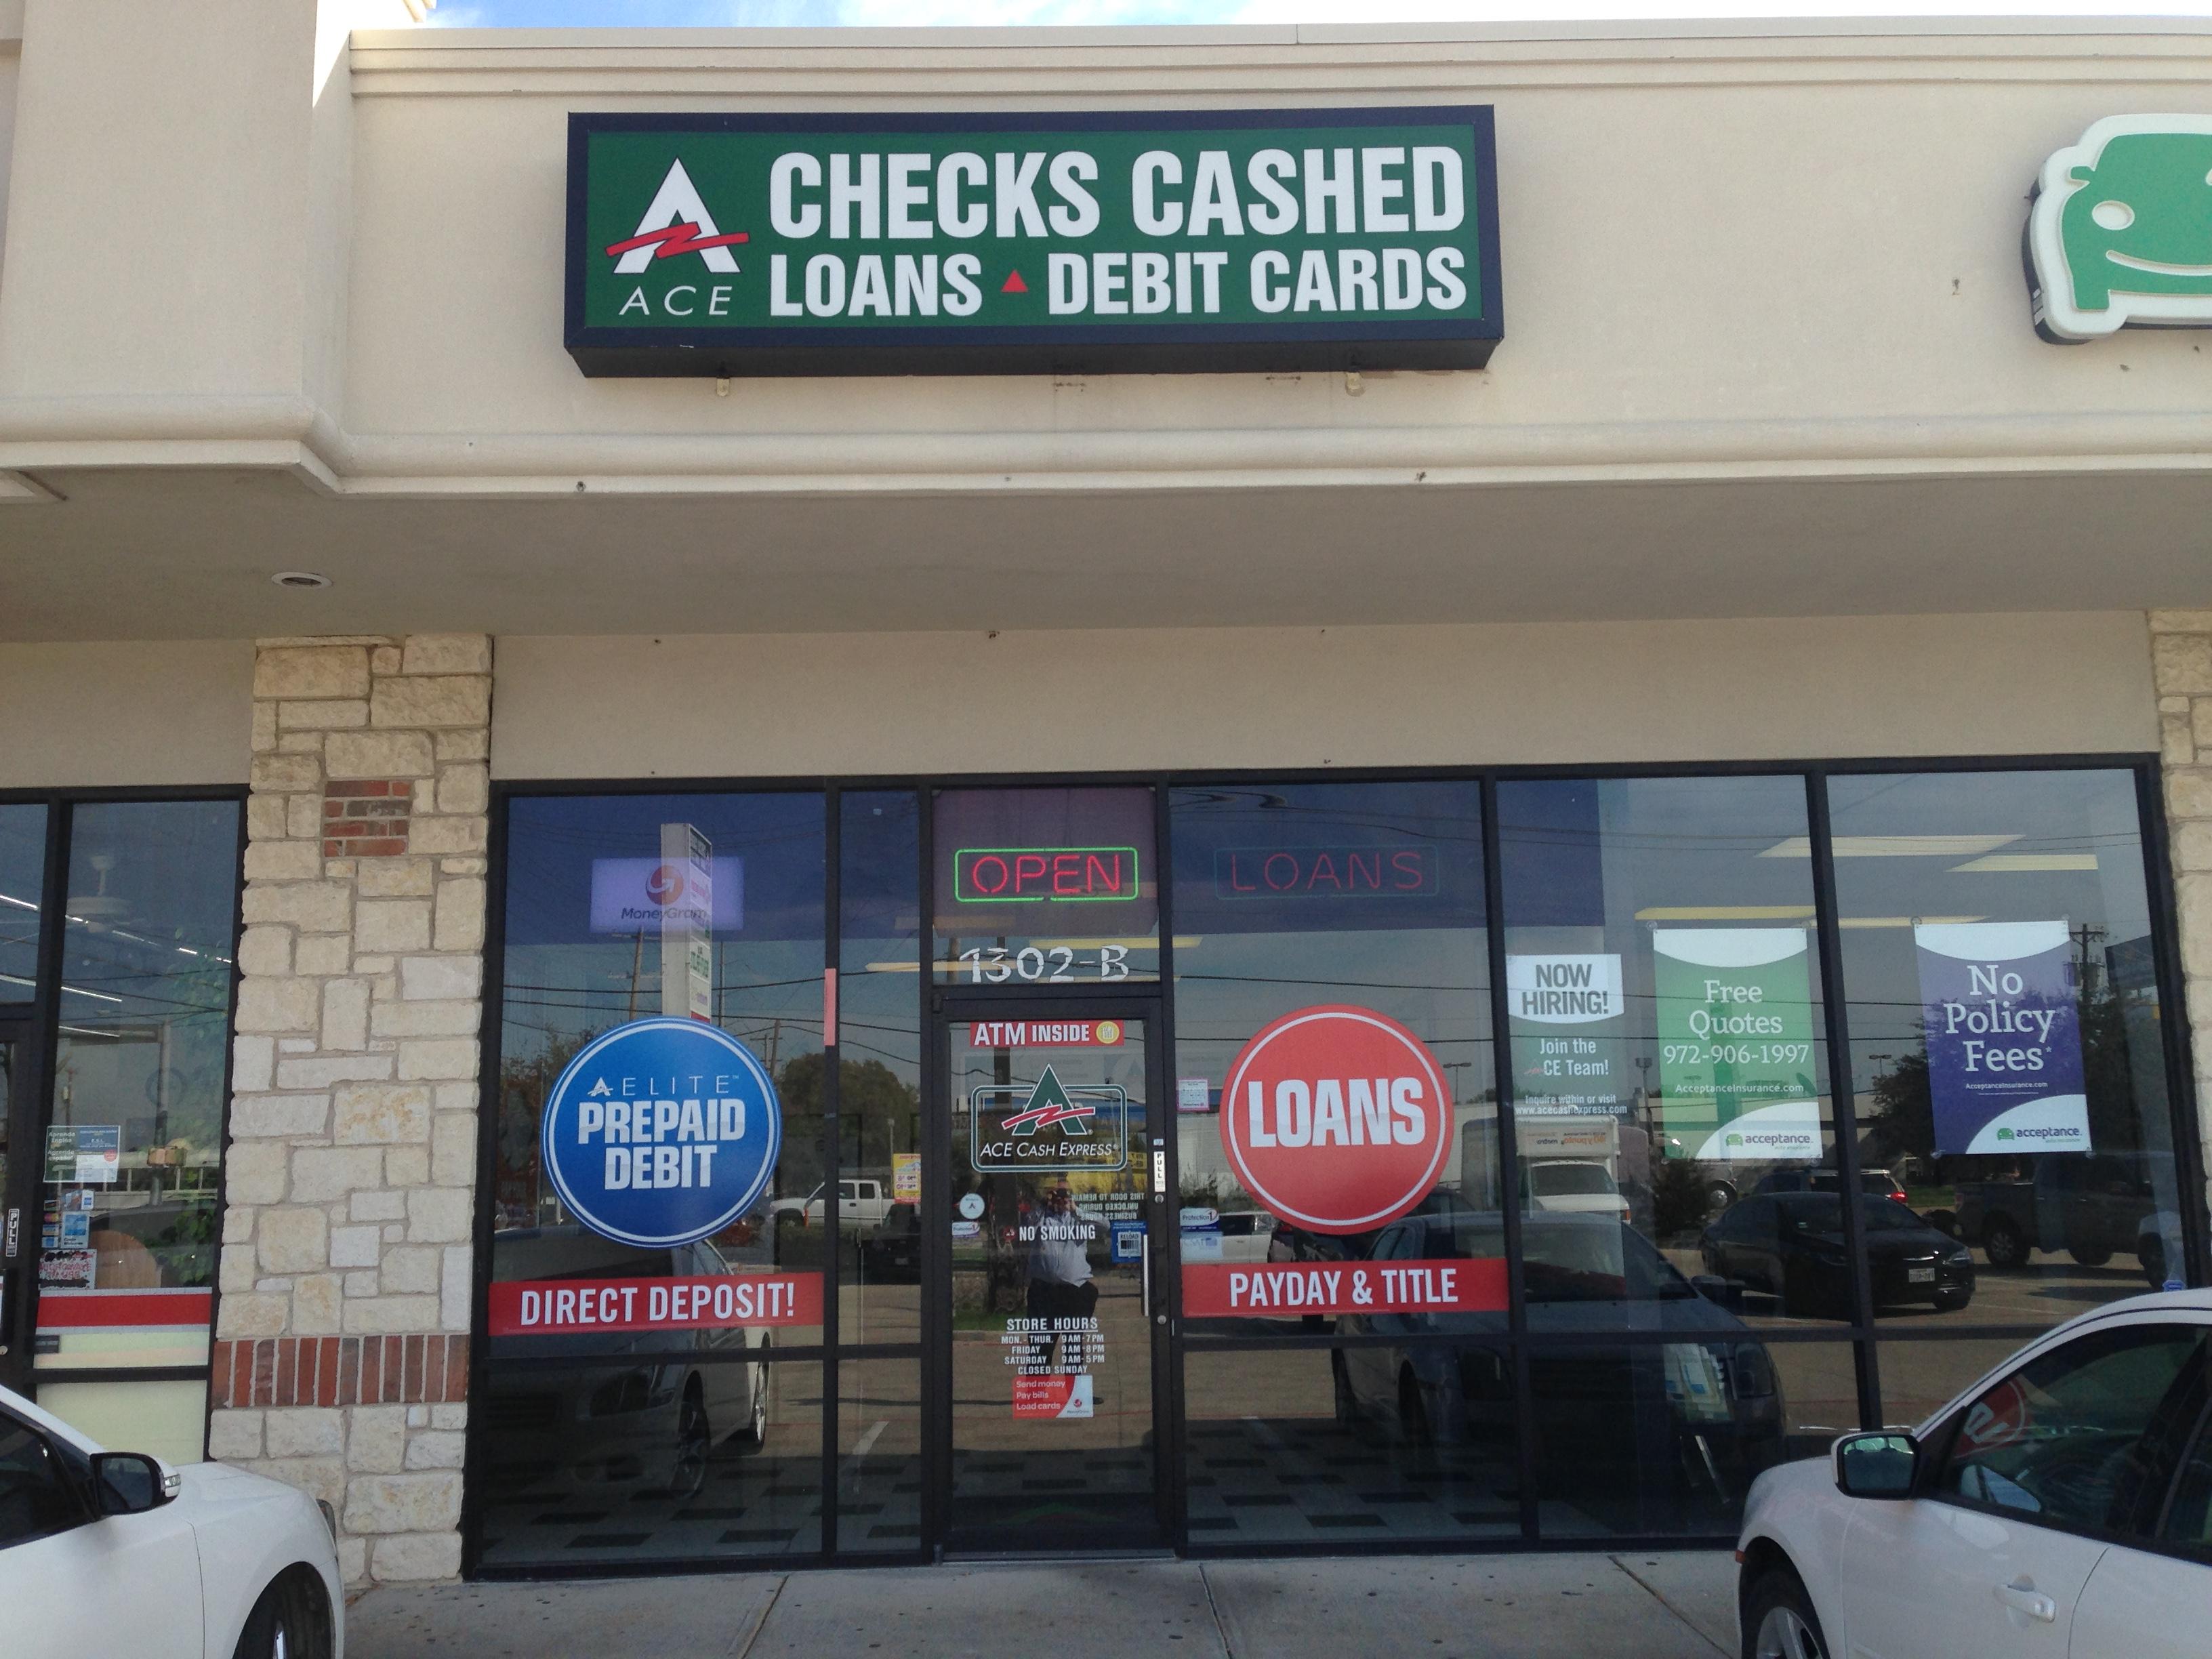 Bank of commerce cash loan image 6